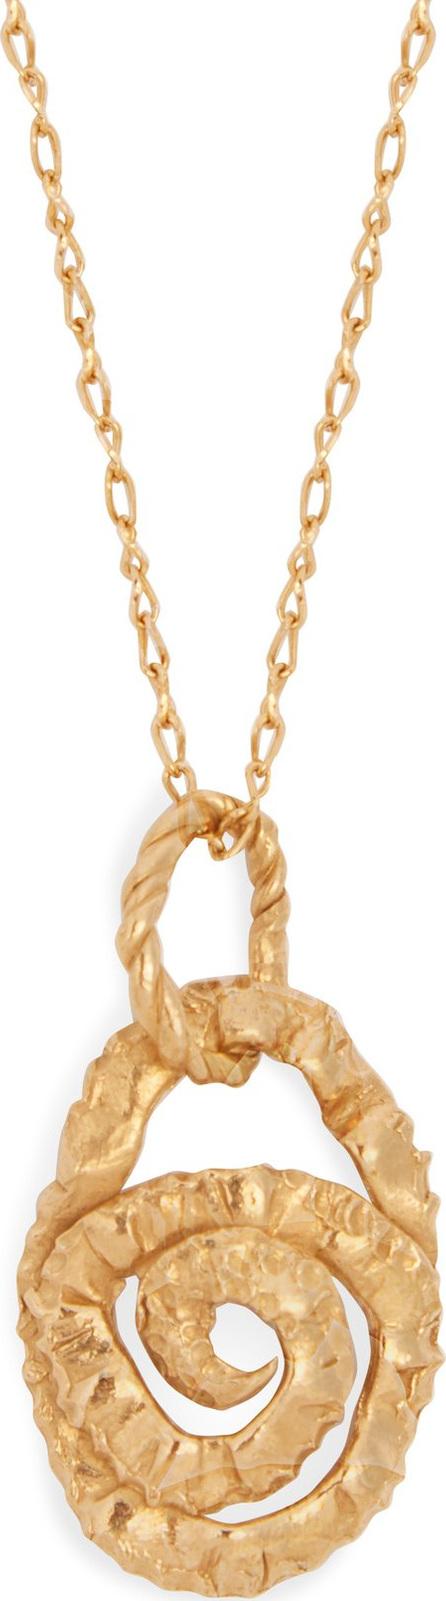 Orit Elhanati Four spiral pendant necklace